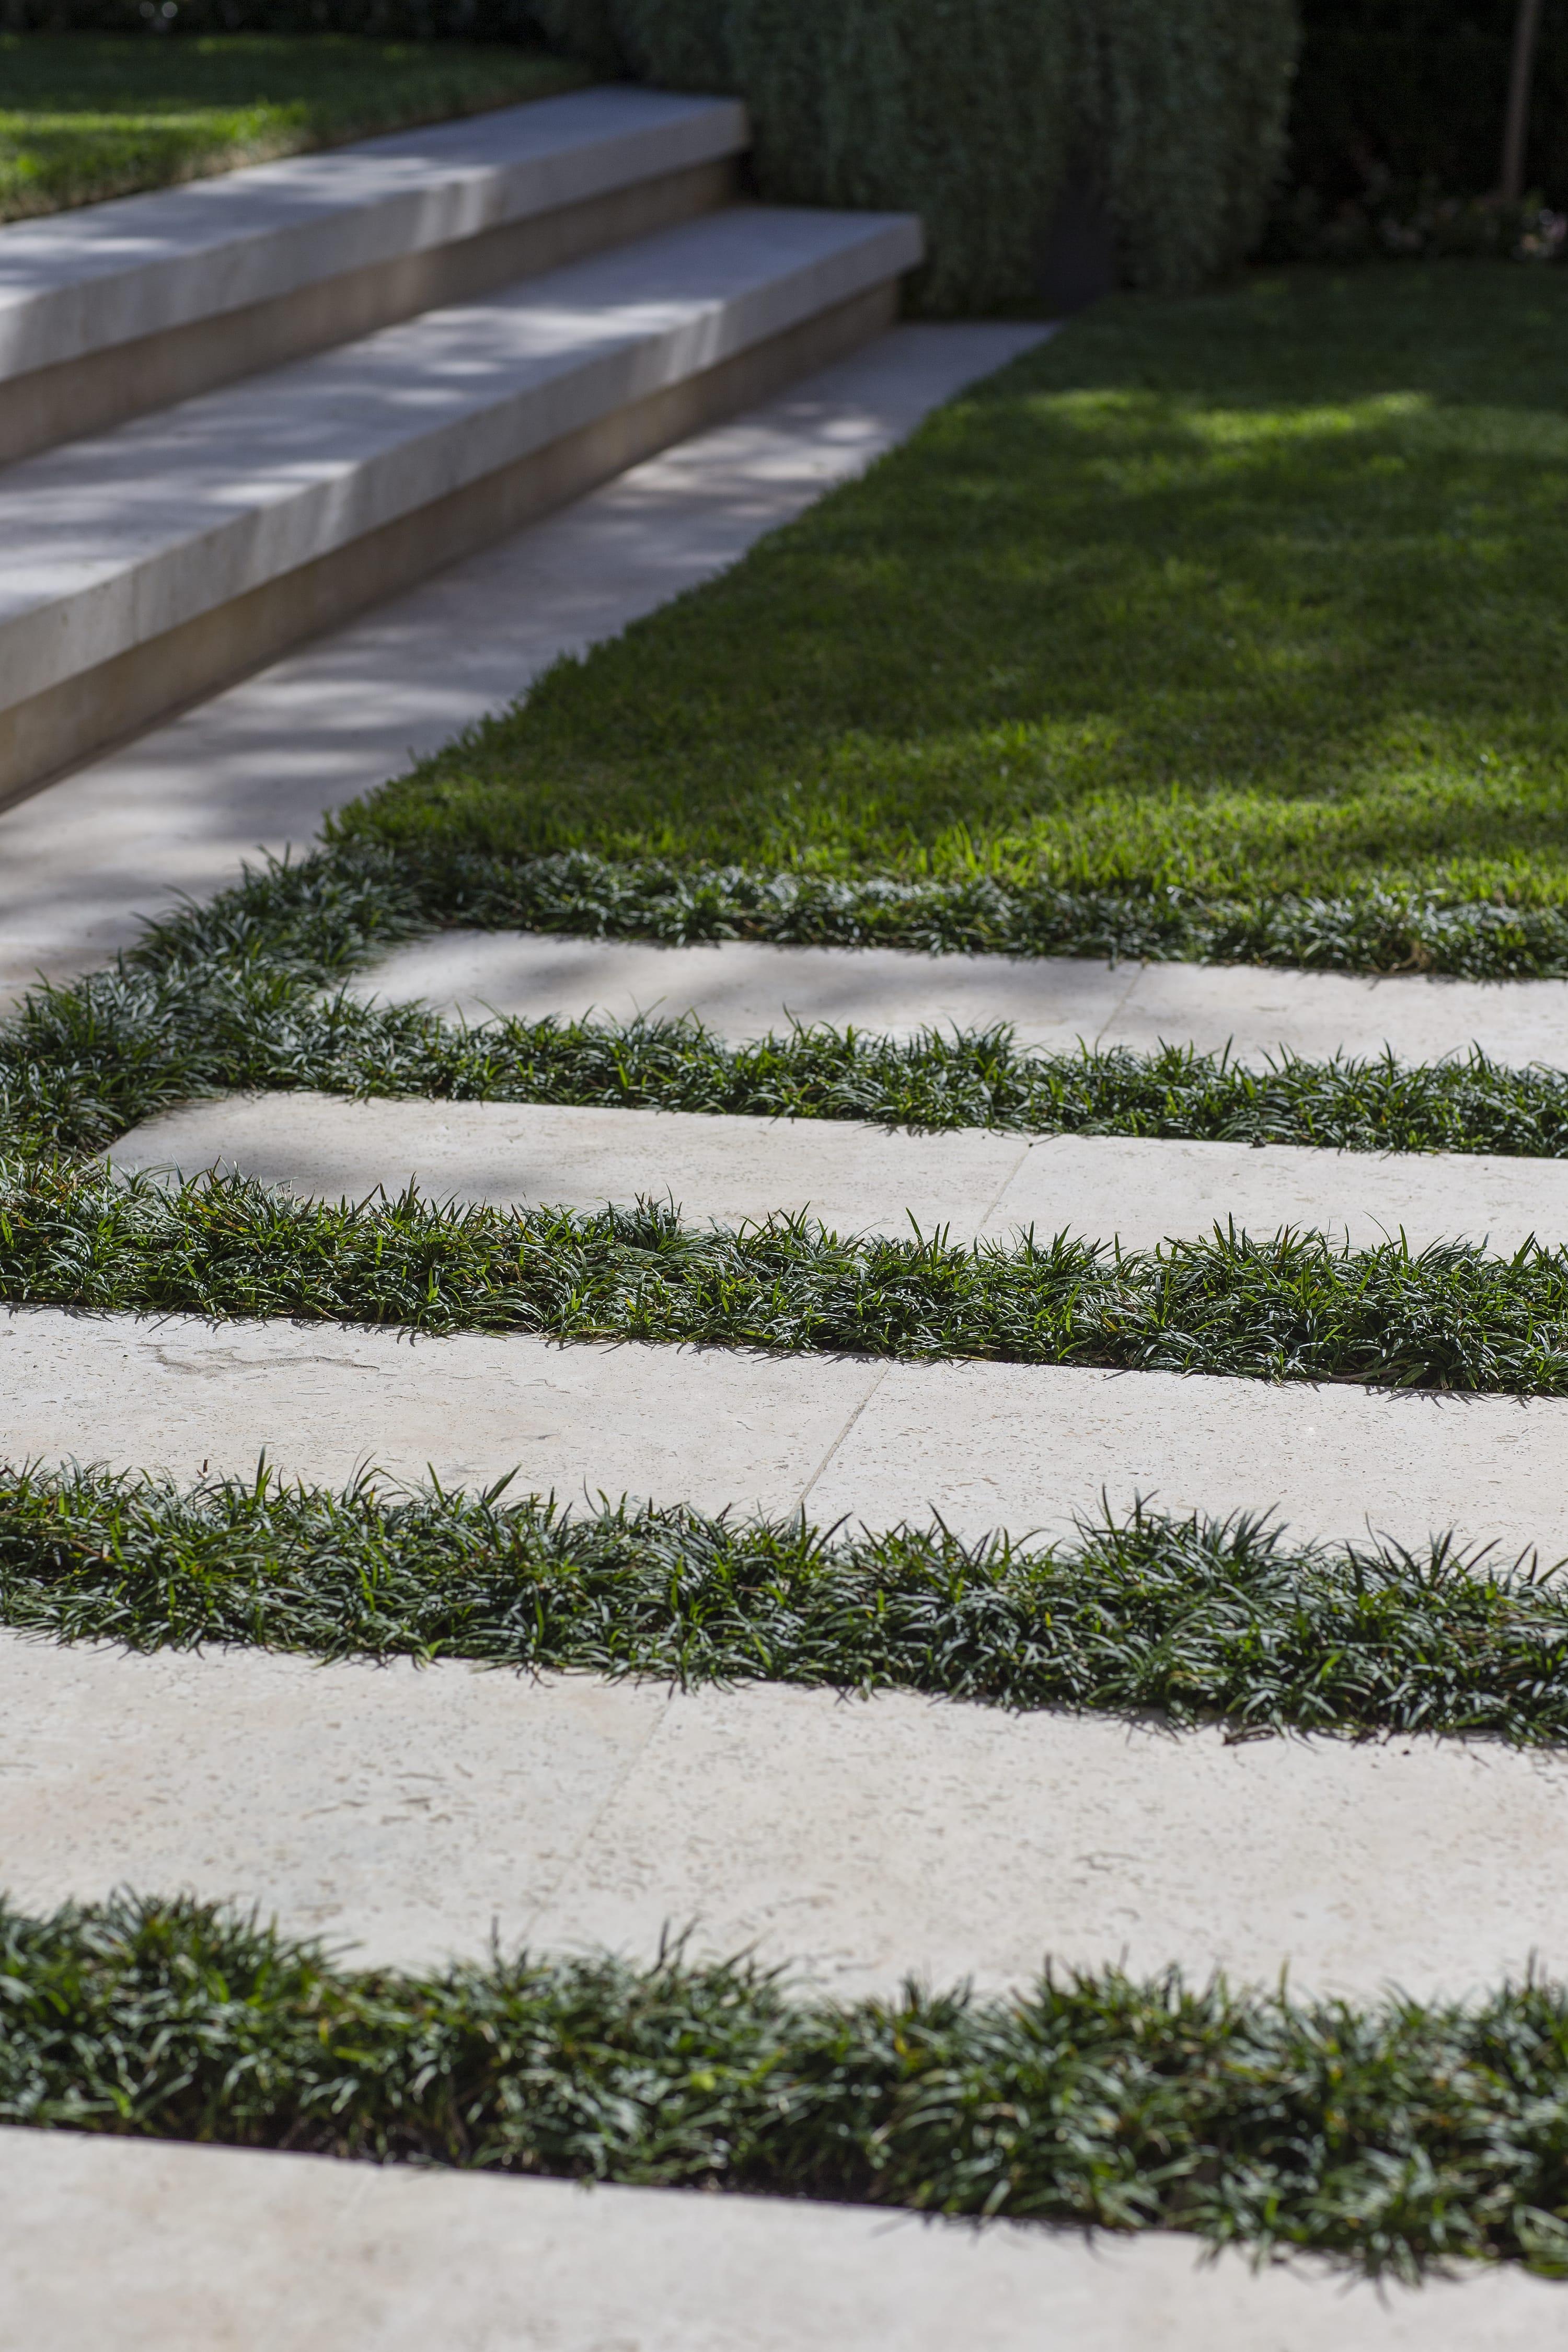 Paved backyard design with greenery